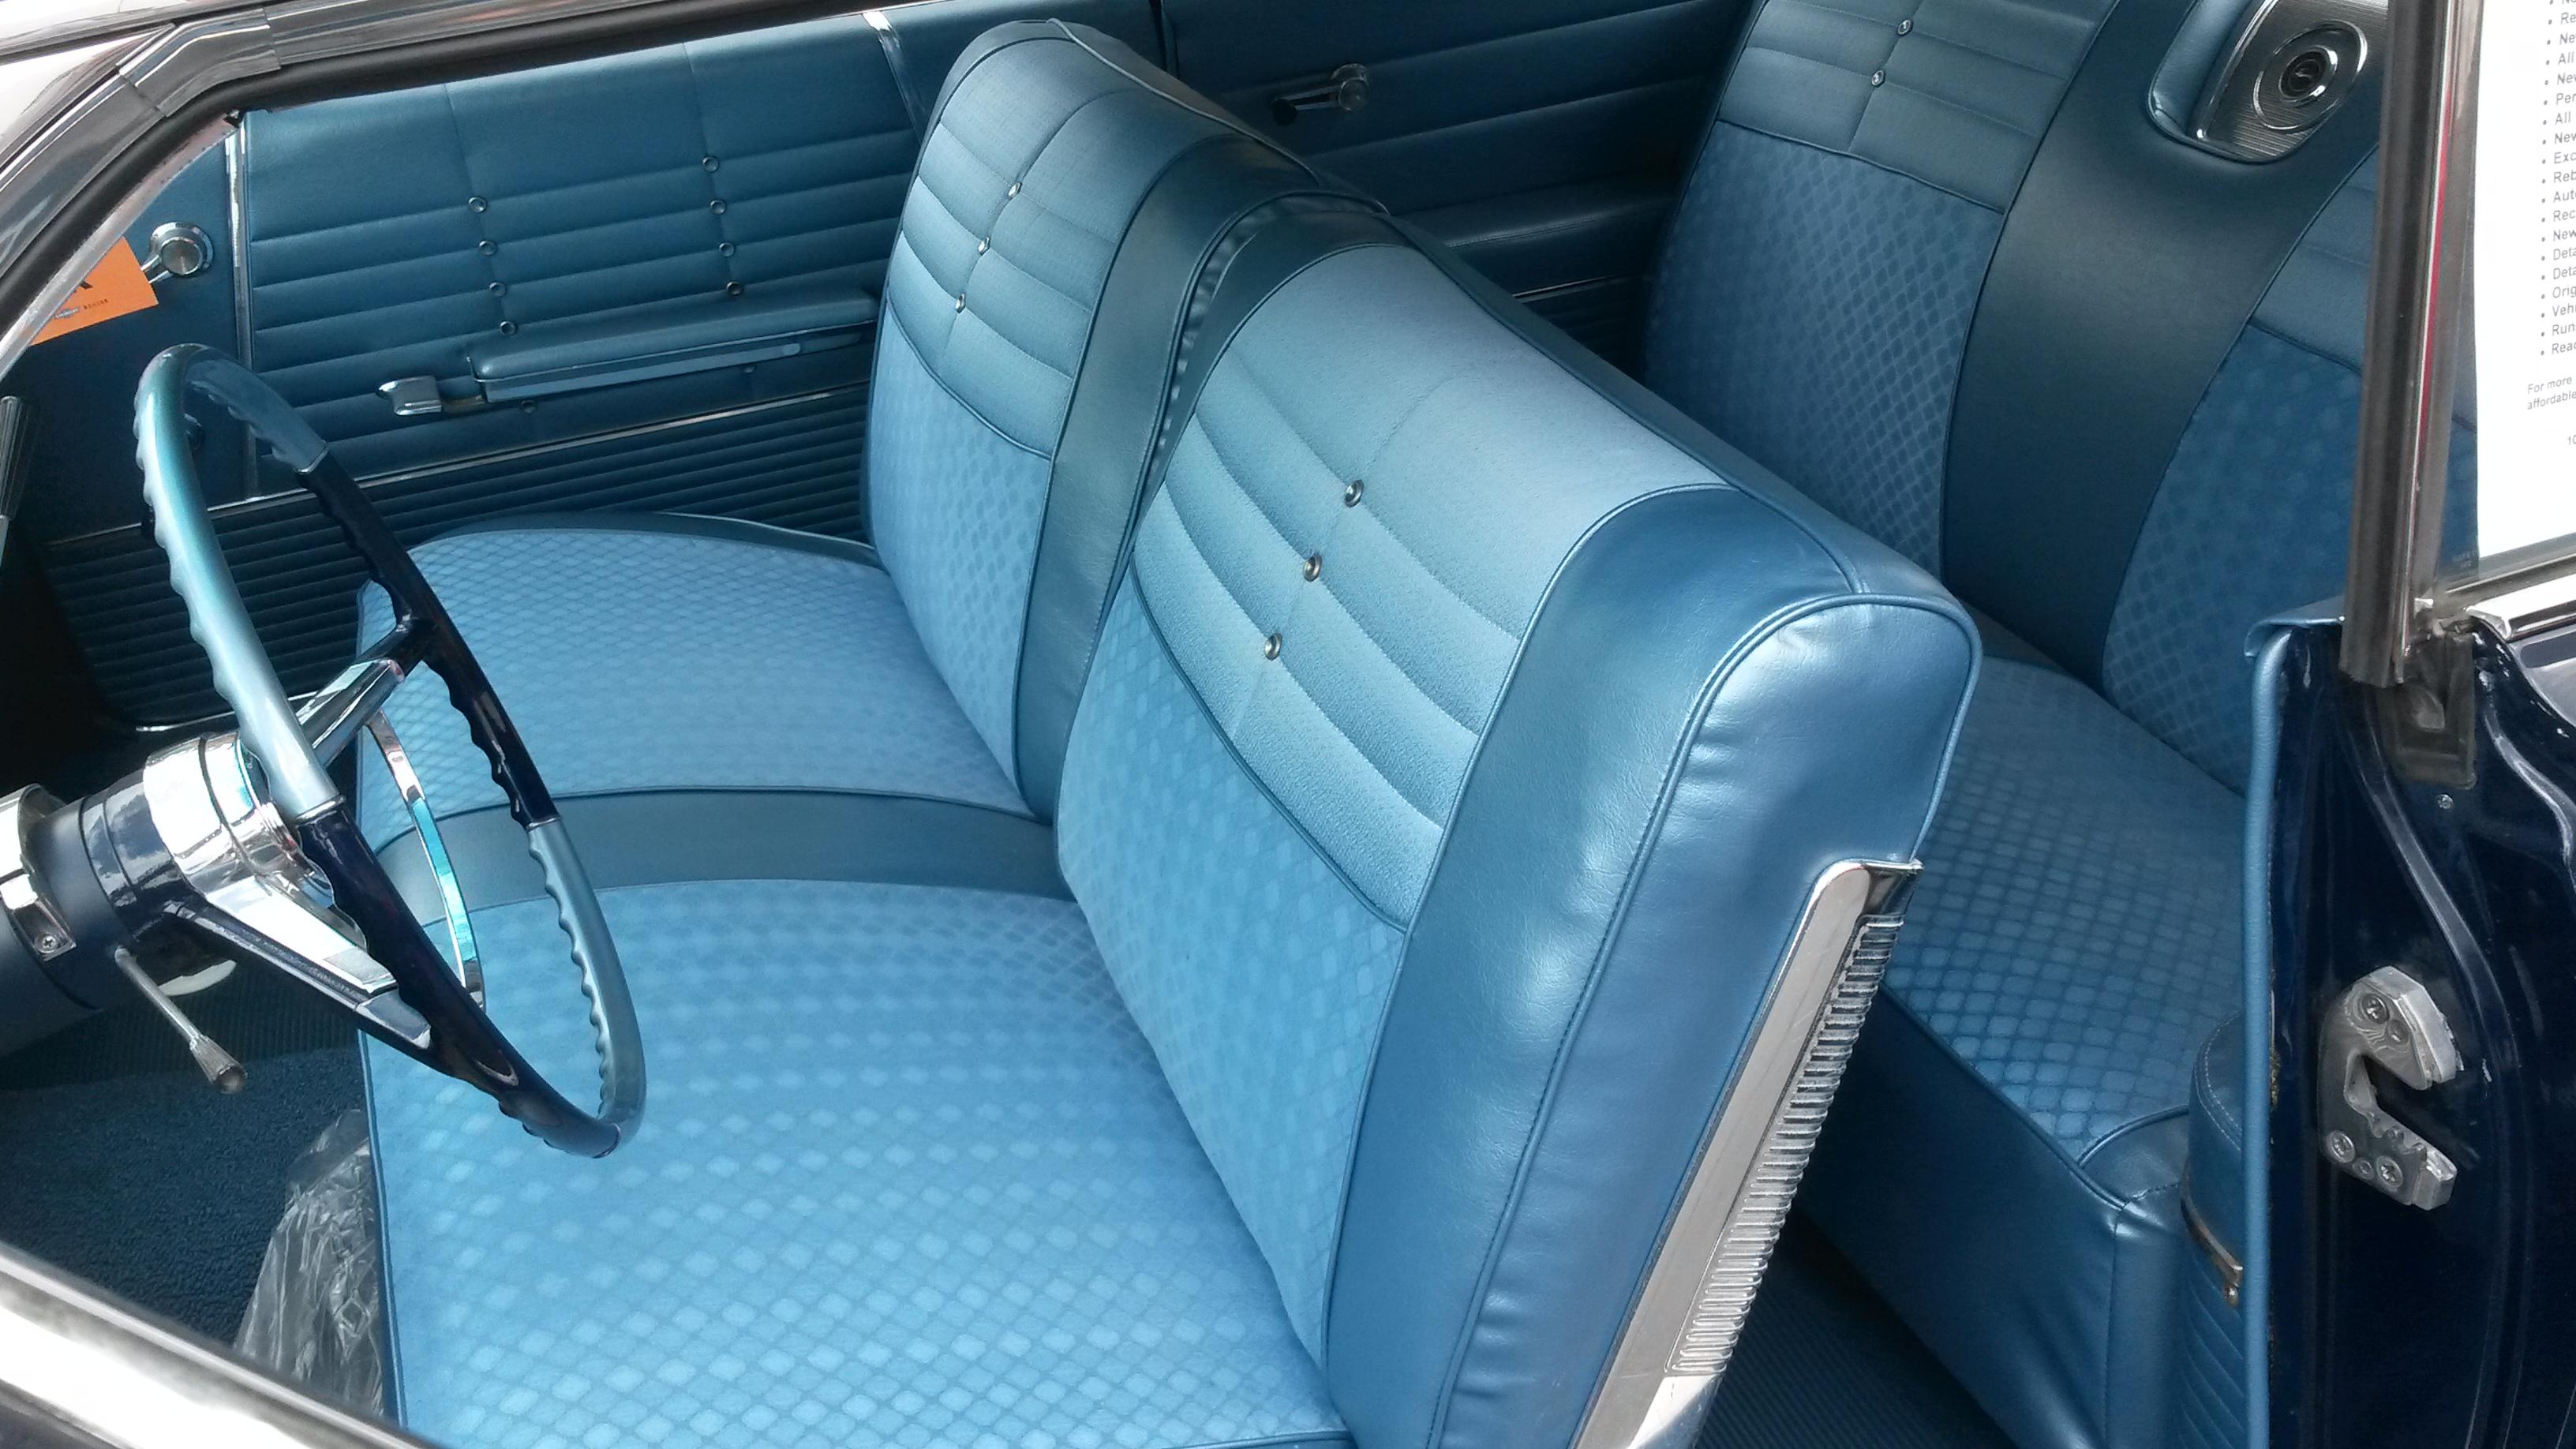 1964 Impala Two Door Hardtop (22)